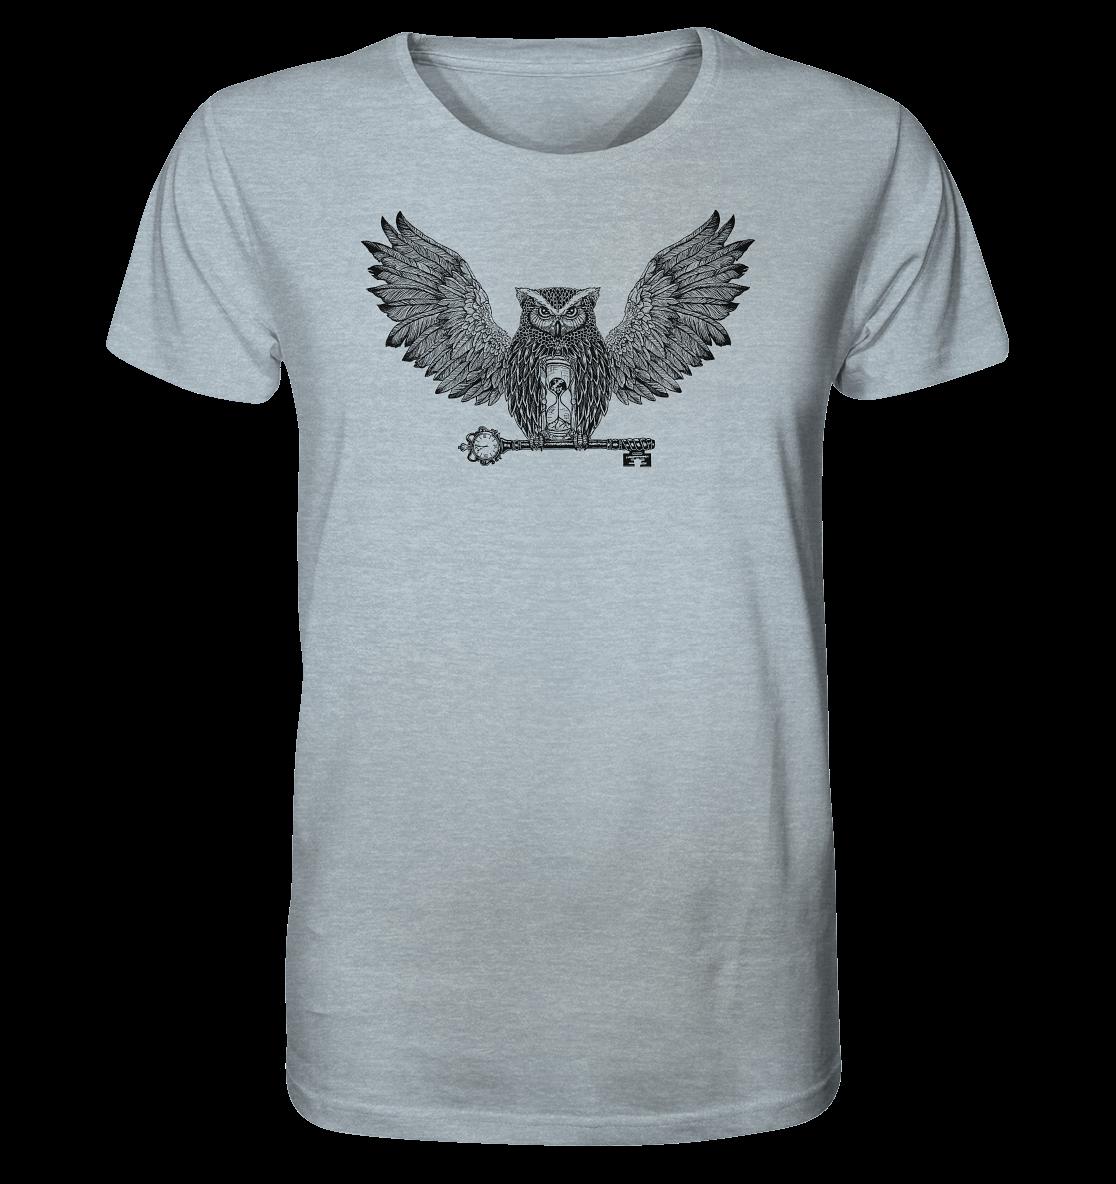 front-organic-shirt-meliert-adbfcb-1116x-5.png